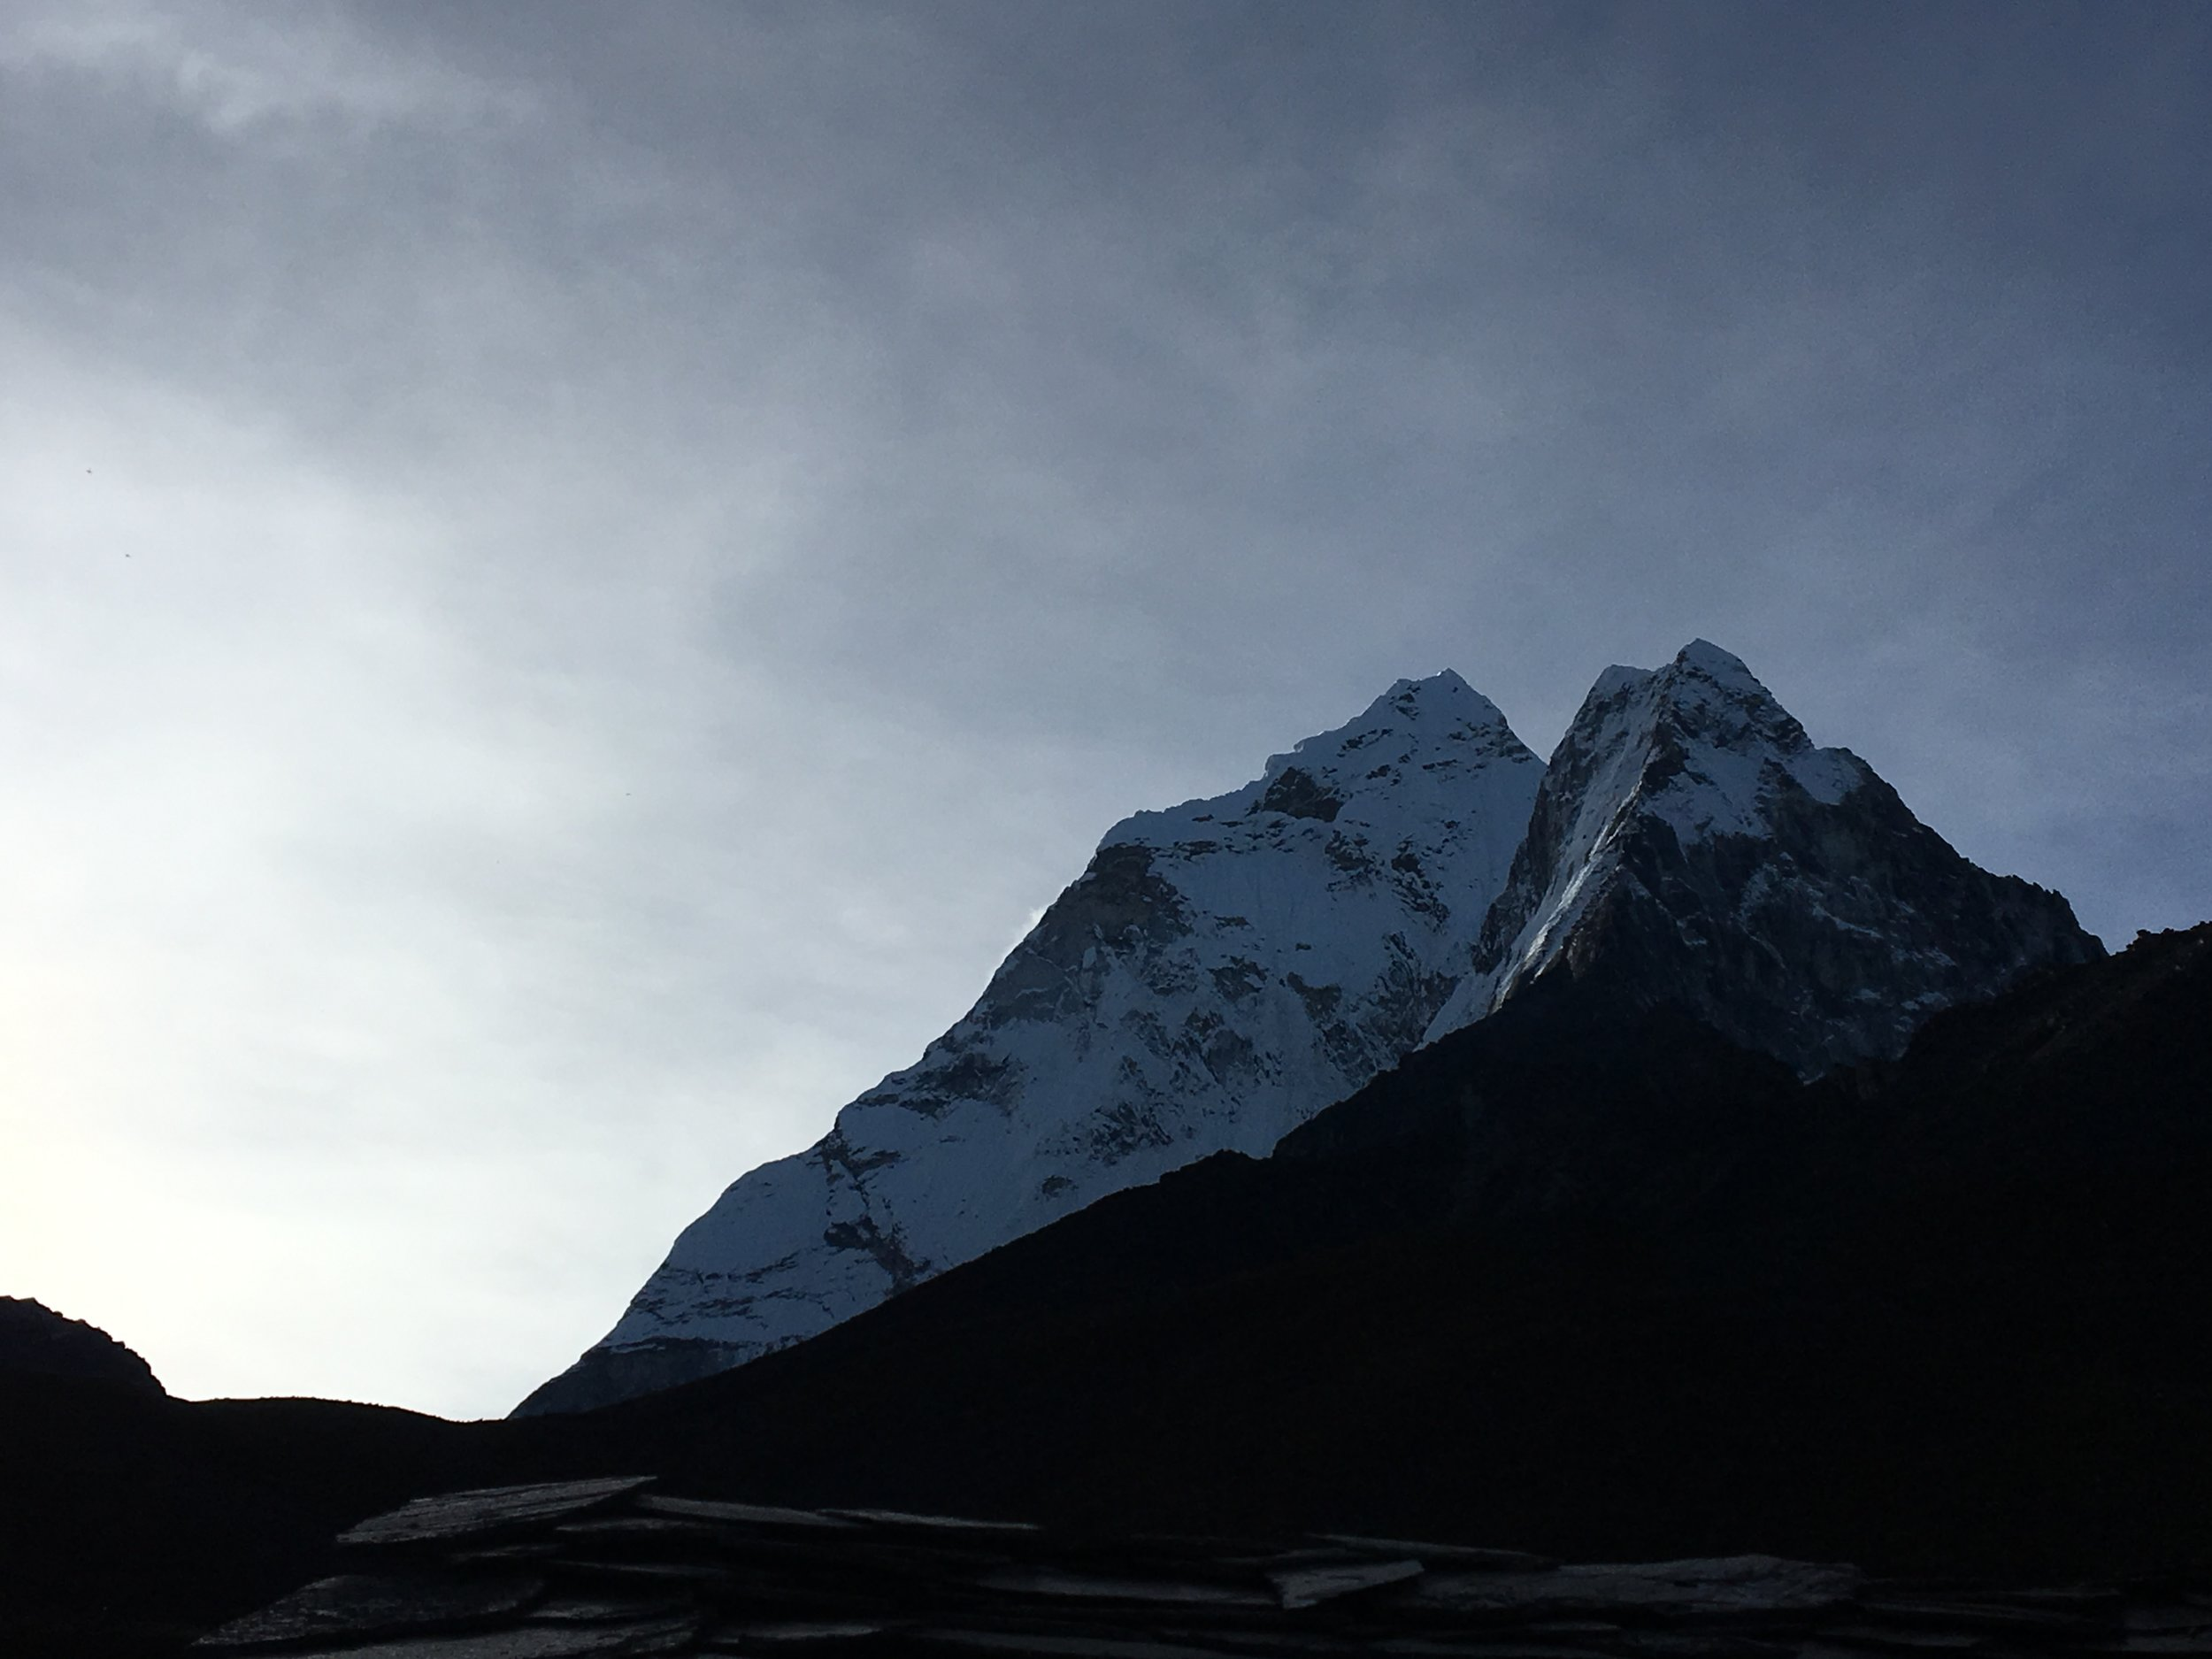 Morning - Himalayas (2017)